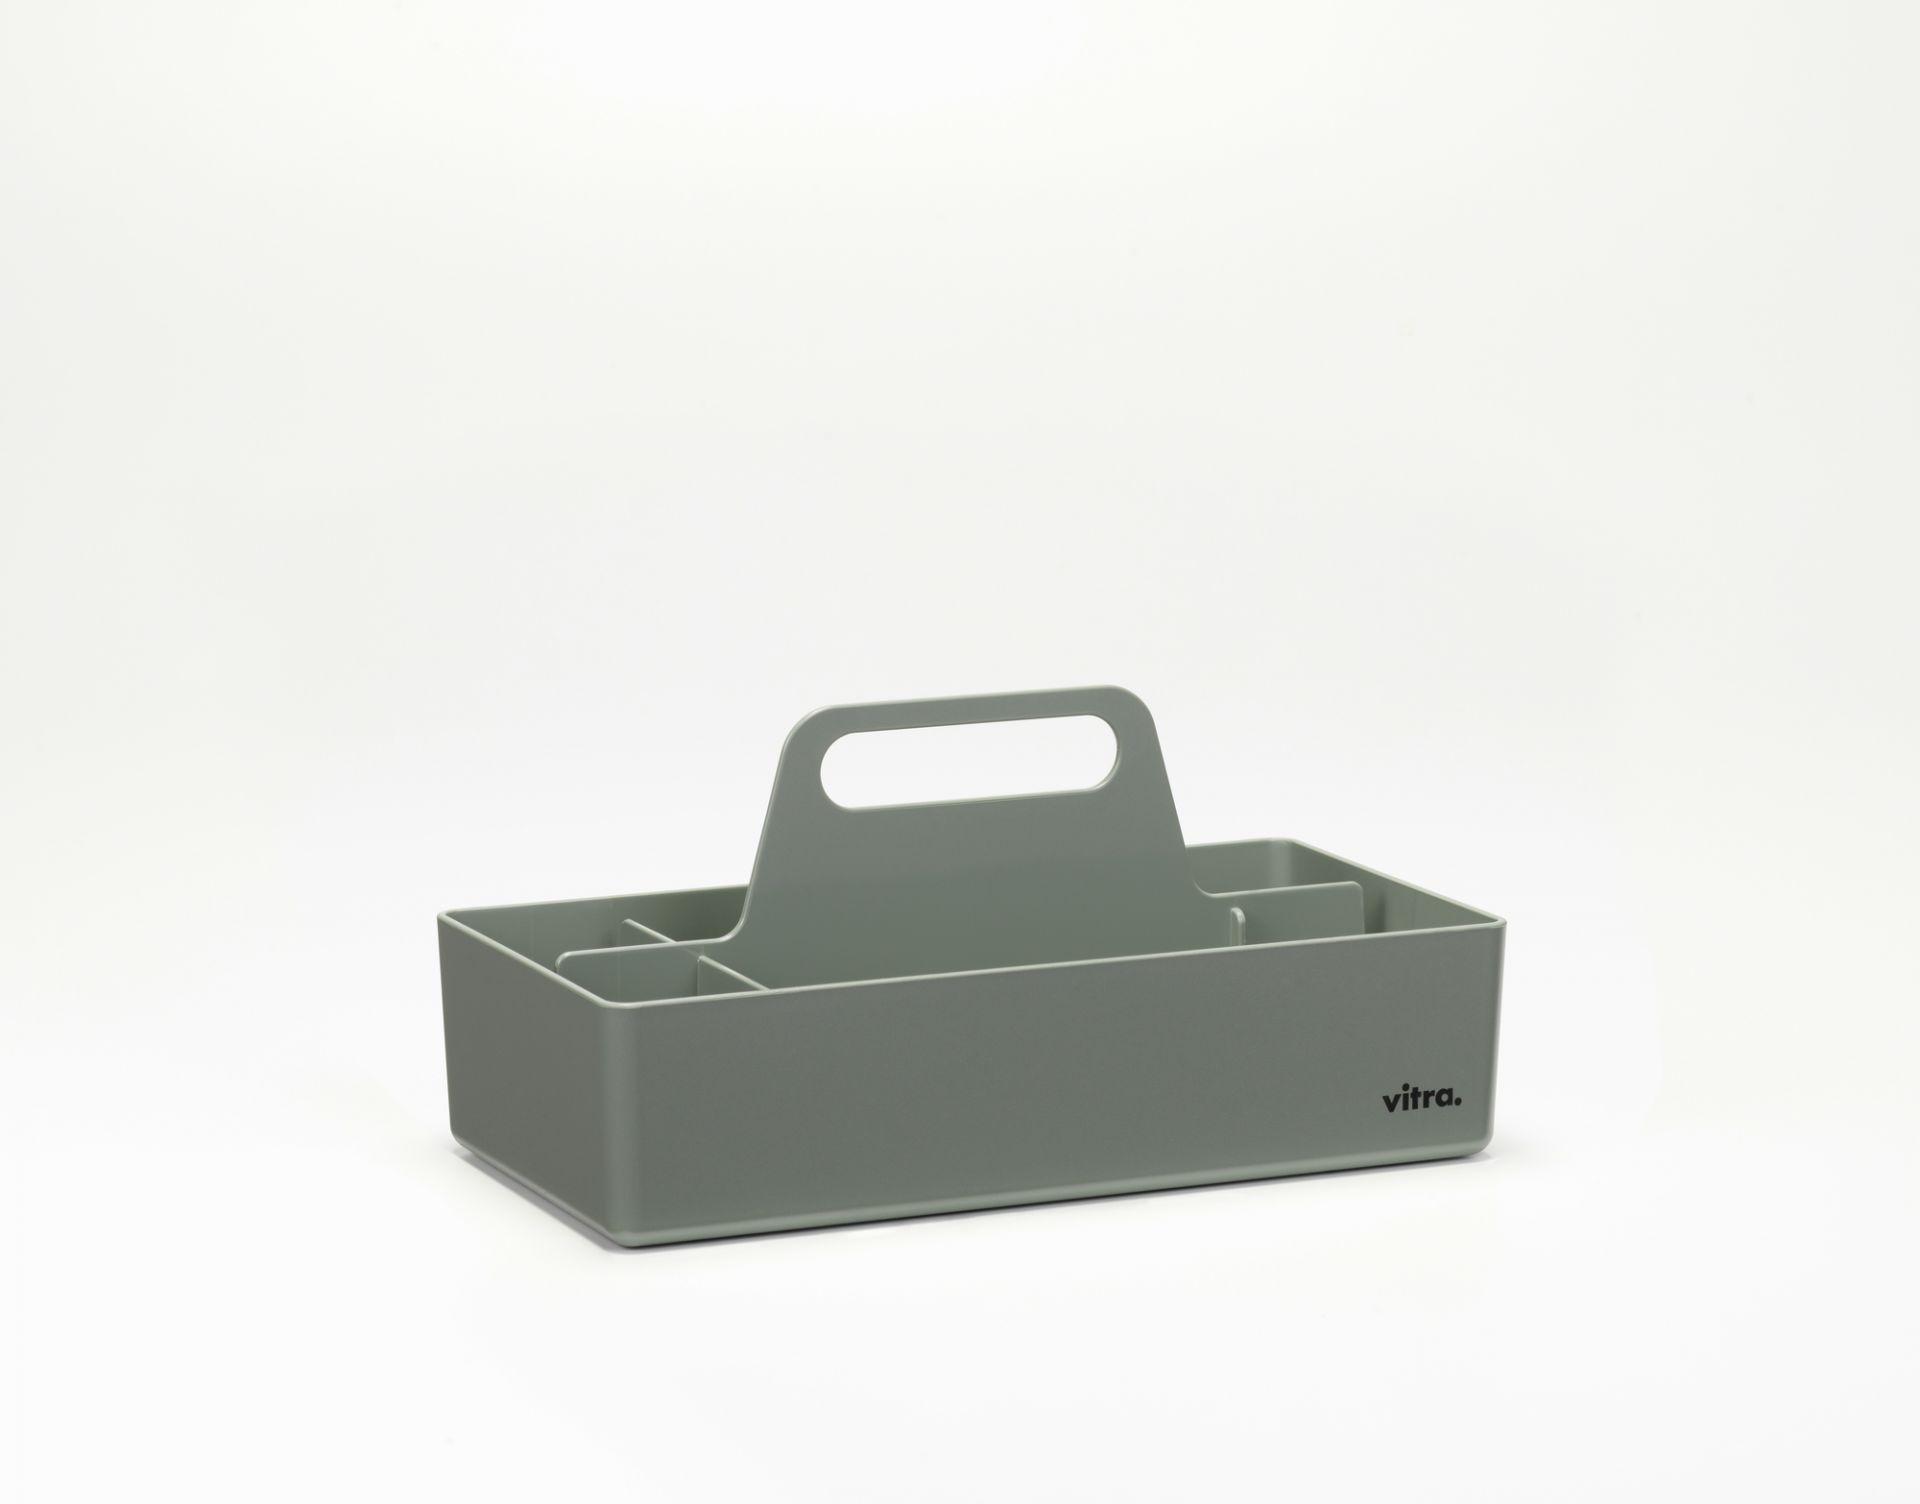 Toolbox Organisationsbox Vitra-moosgrau